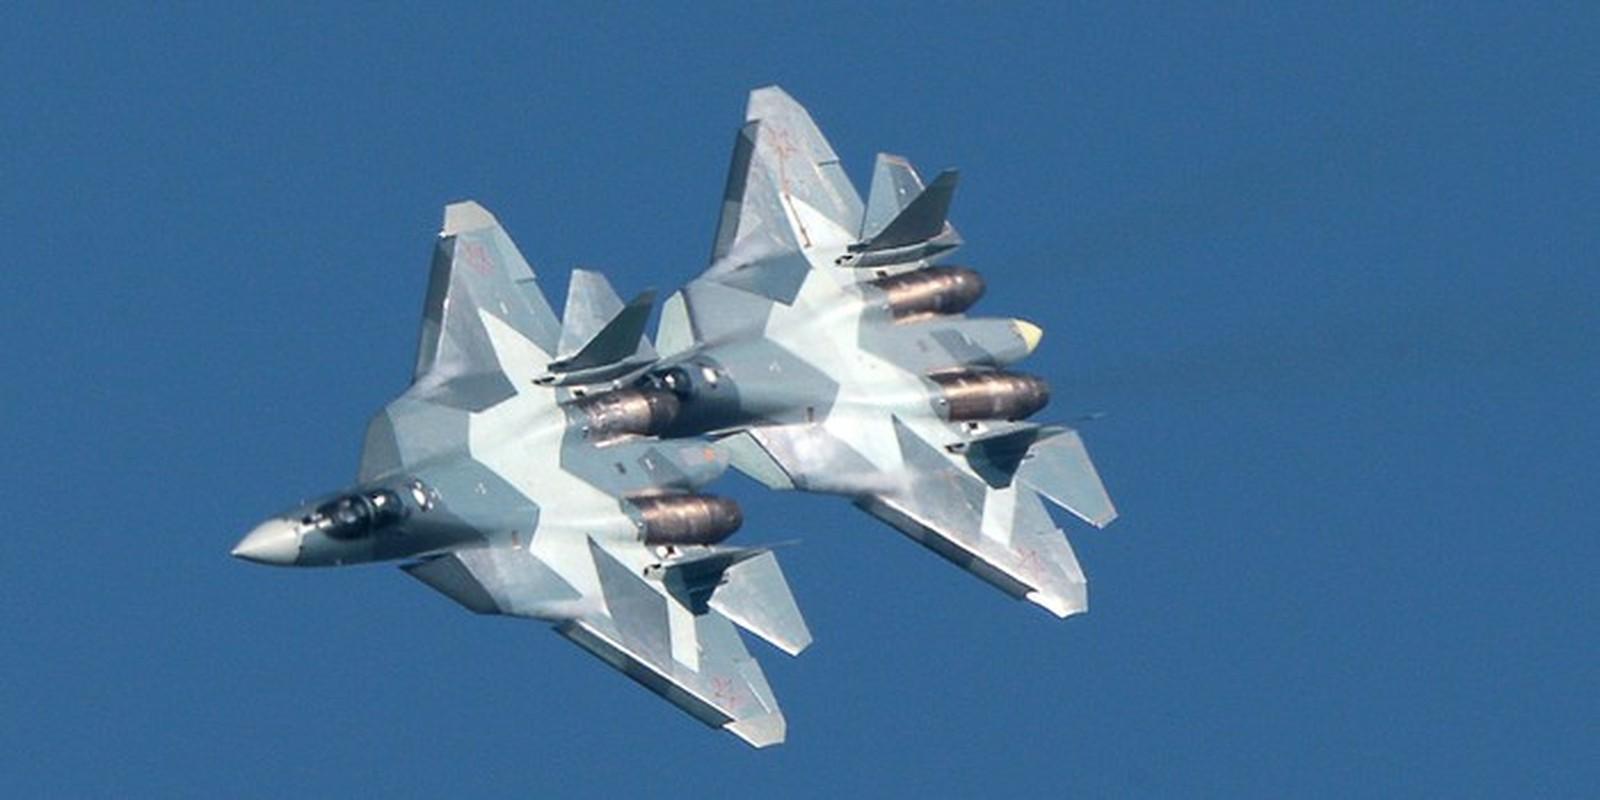 Khach hang bi an dat mua lo tiem kich Su-57 lon nhat lich su-Hinh-5